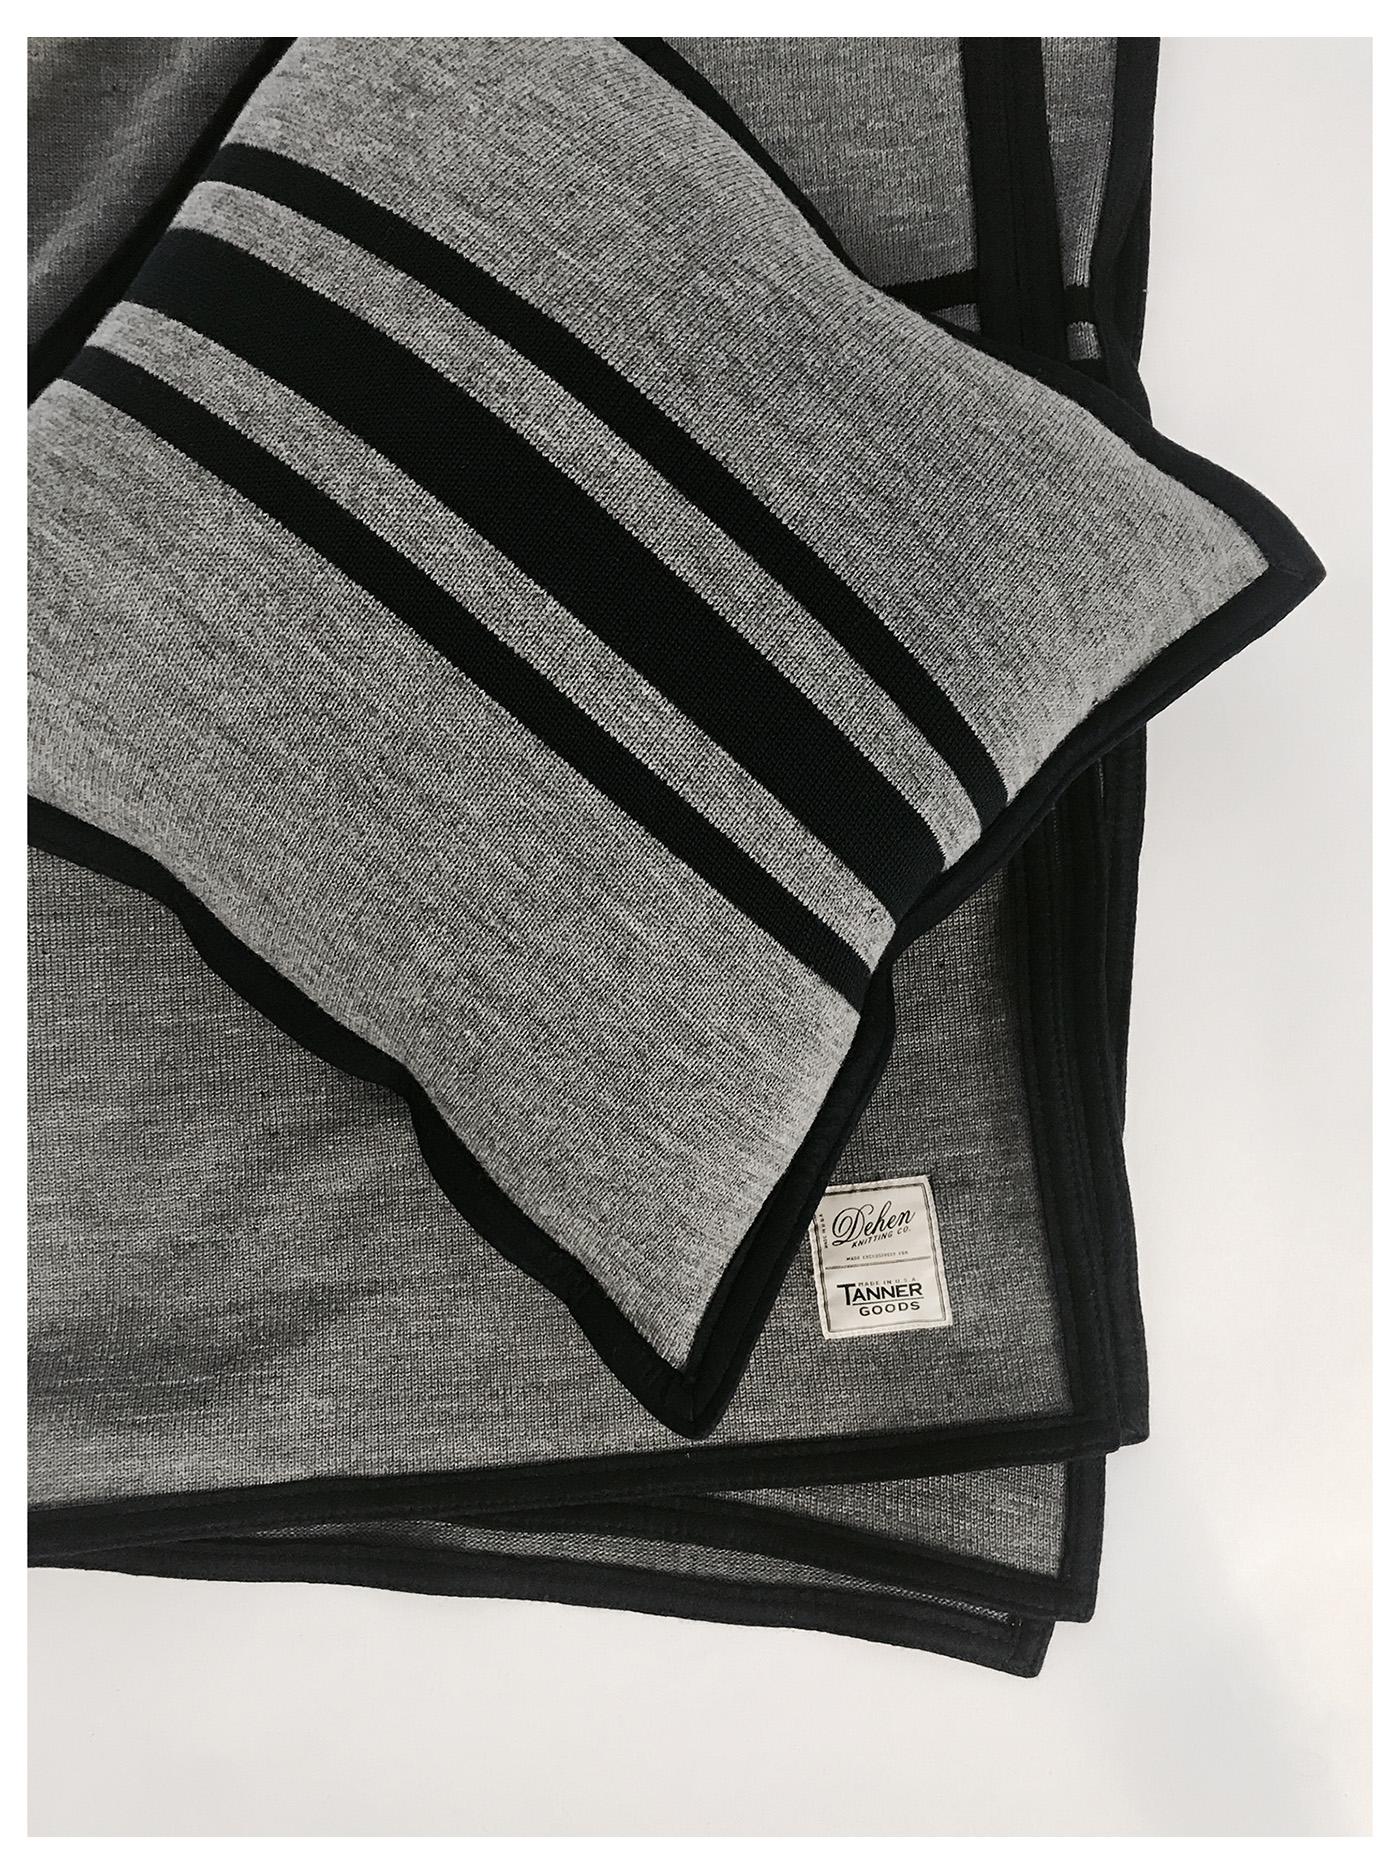 Blanket_Pillow_6 copy.jpg